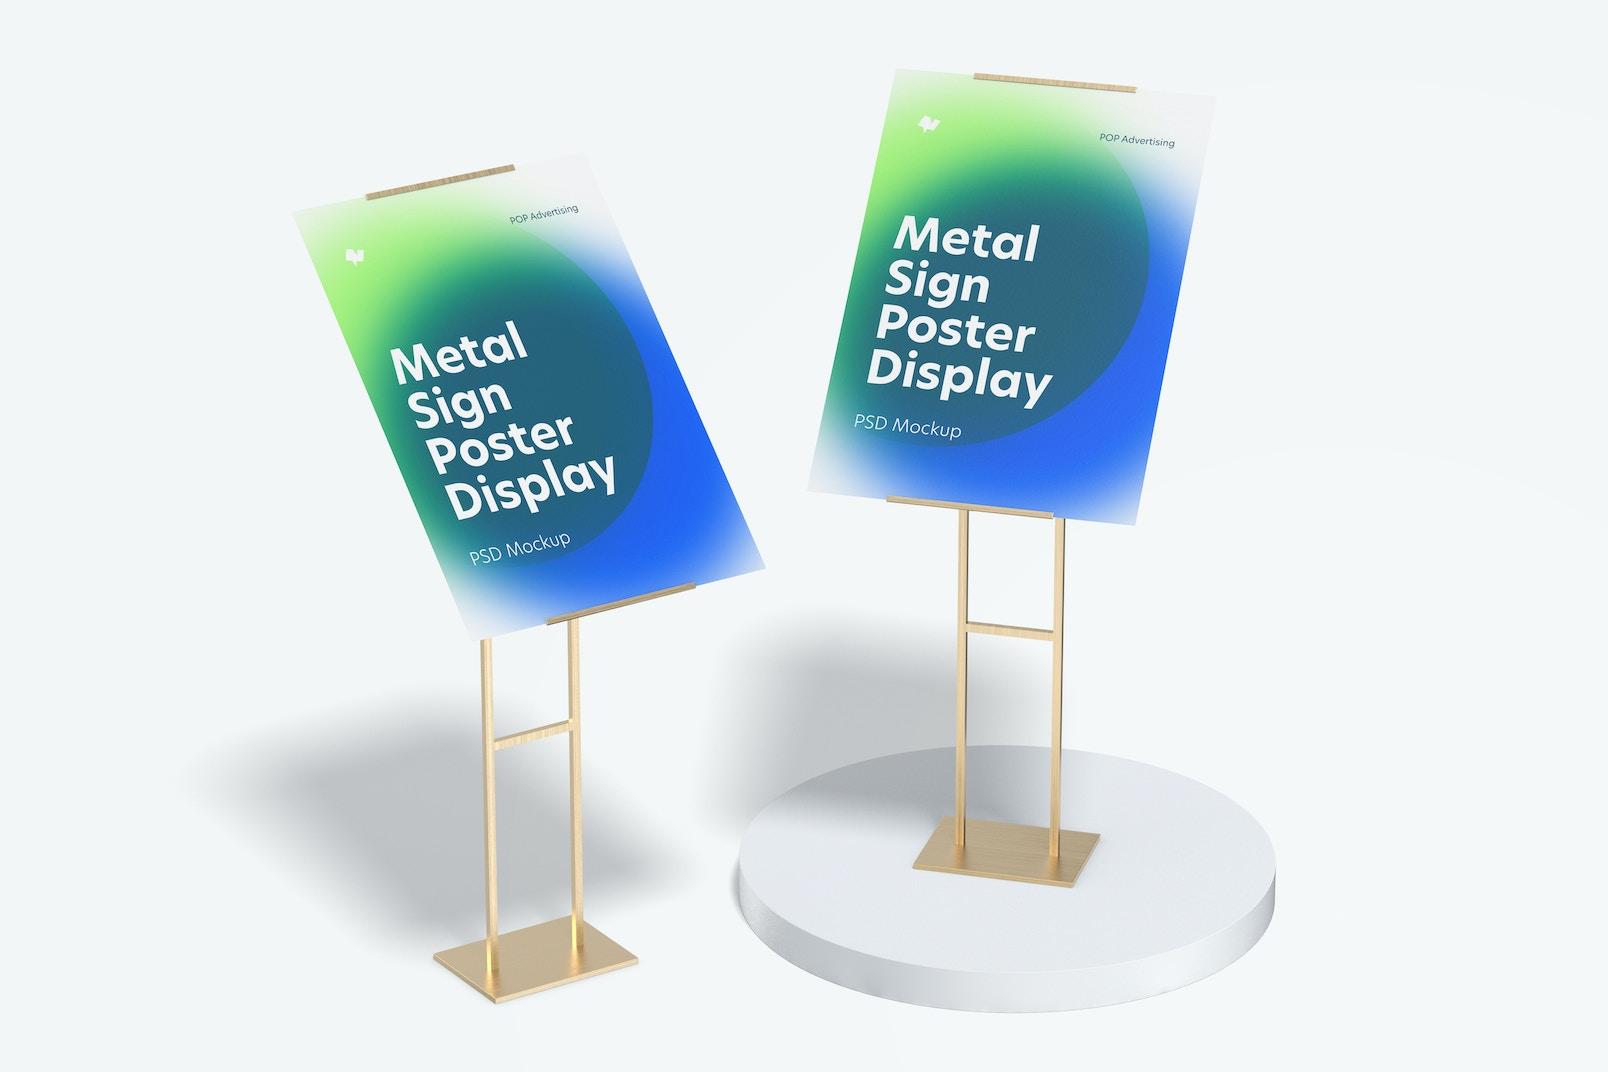 Metal Signs Poster Floor Display Mockup, Perspective